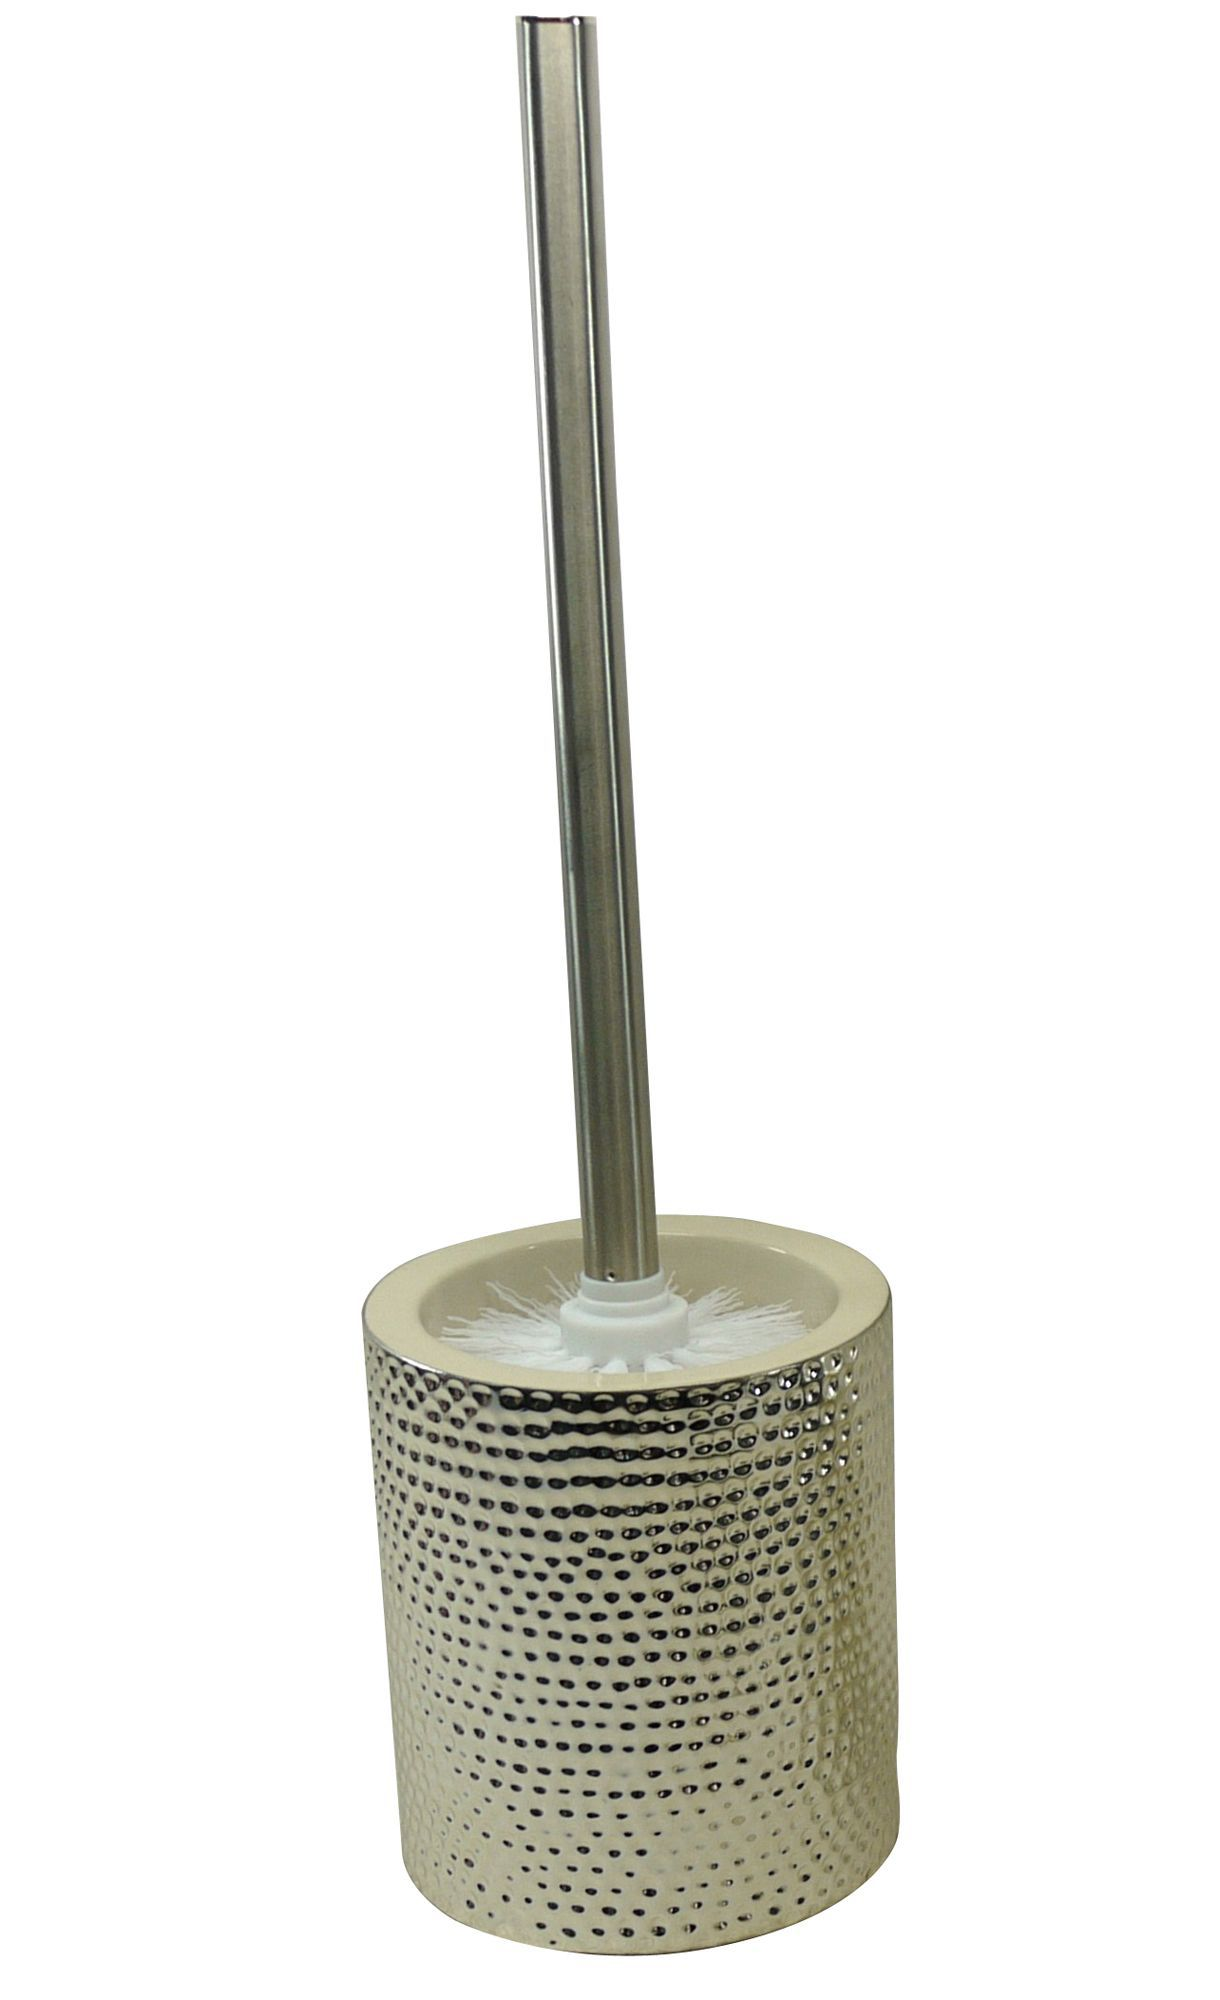 cooke lewis silver dimpled effect toilet brush holder departments diy at b q. Black Bedroom Furniture Sets. Home Design Ideas